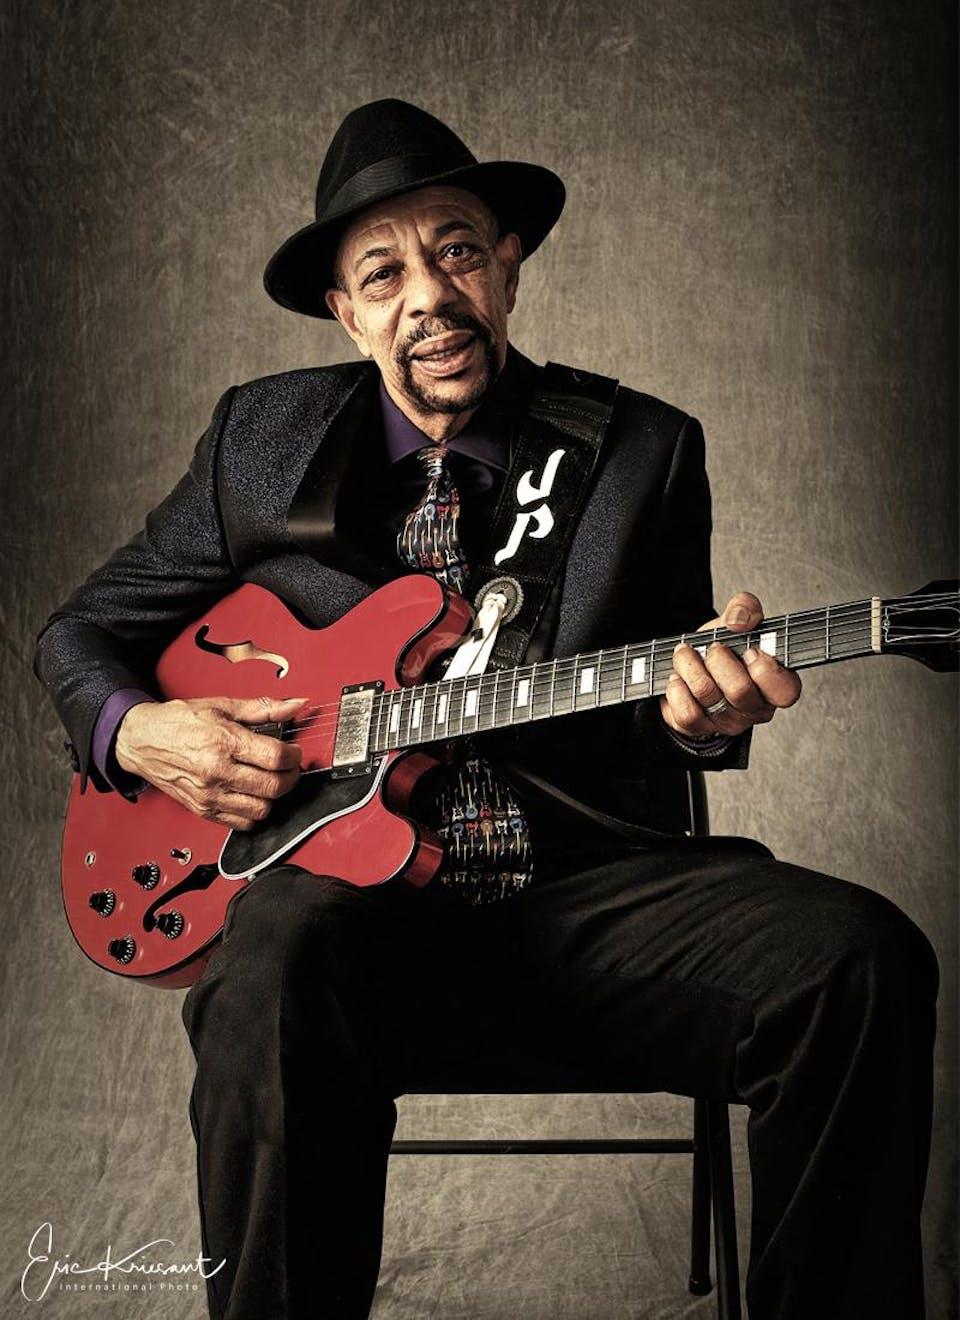 Antone's Anniversary: Chicago Blues Legend John Primer w/ Lou Ann Barton